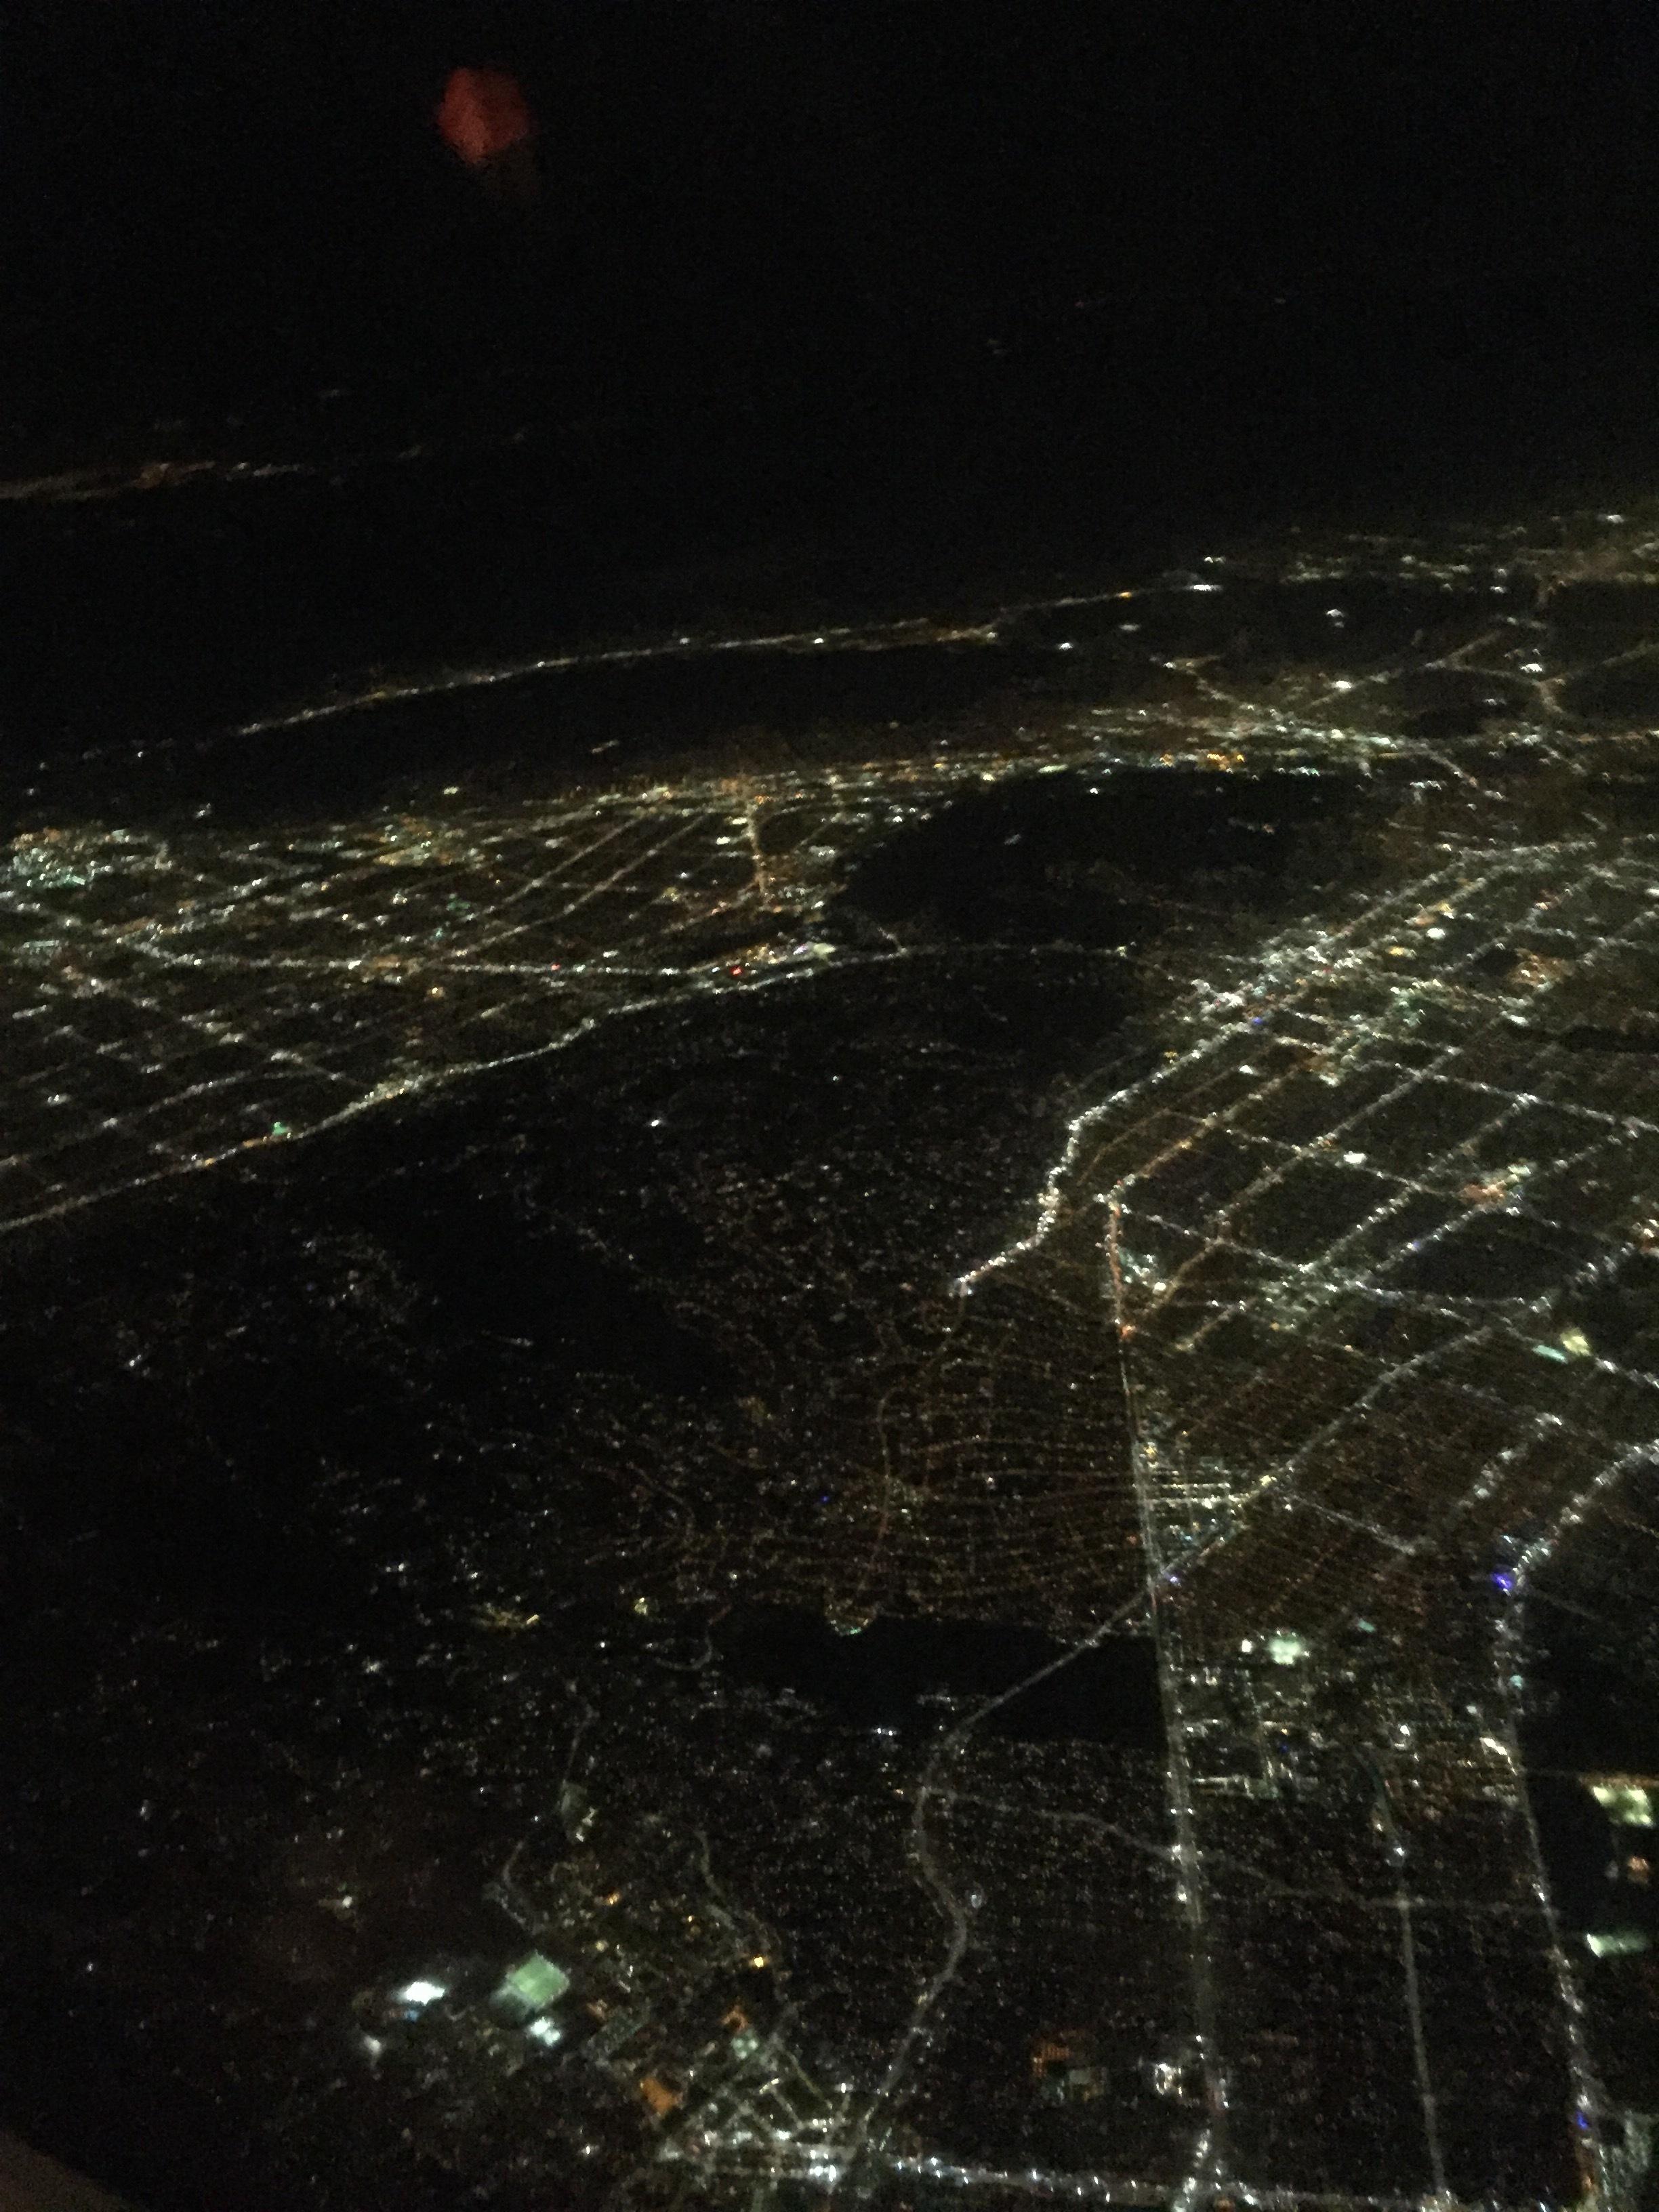 Leaving LA - Elder Michael Blanding is down there somewhere